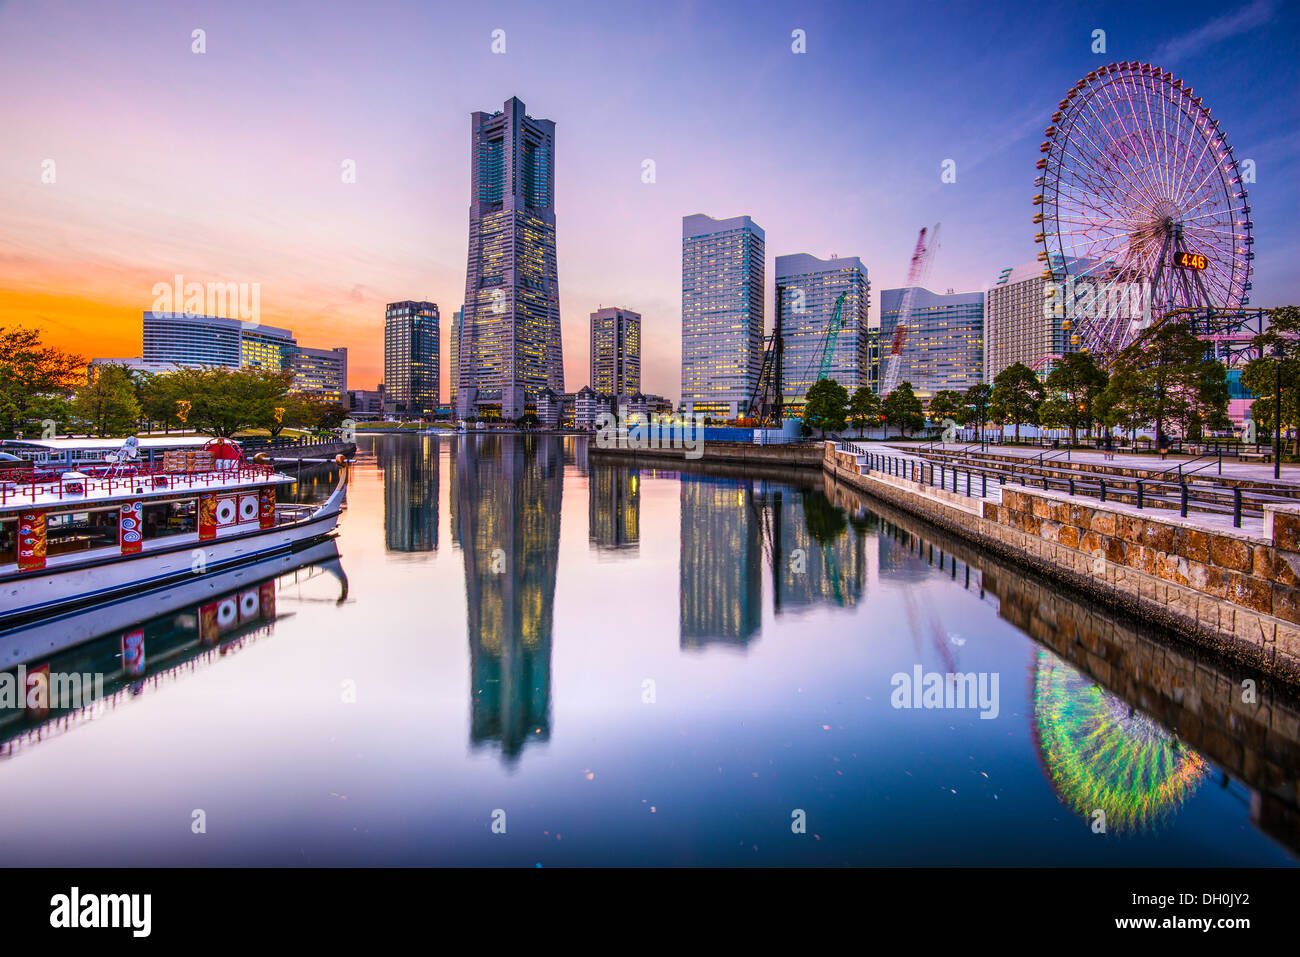 Yokohama, Japan skyline at Minato Mirai waterfront district. - Stock Image